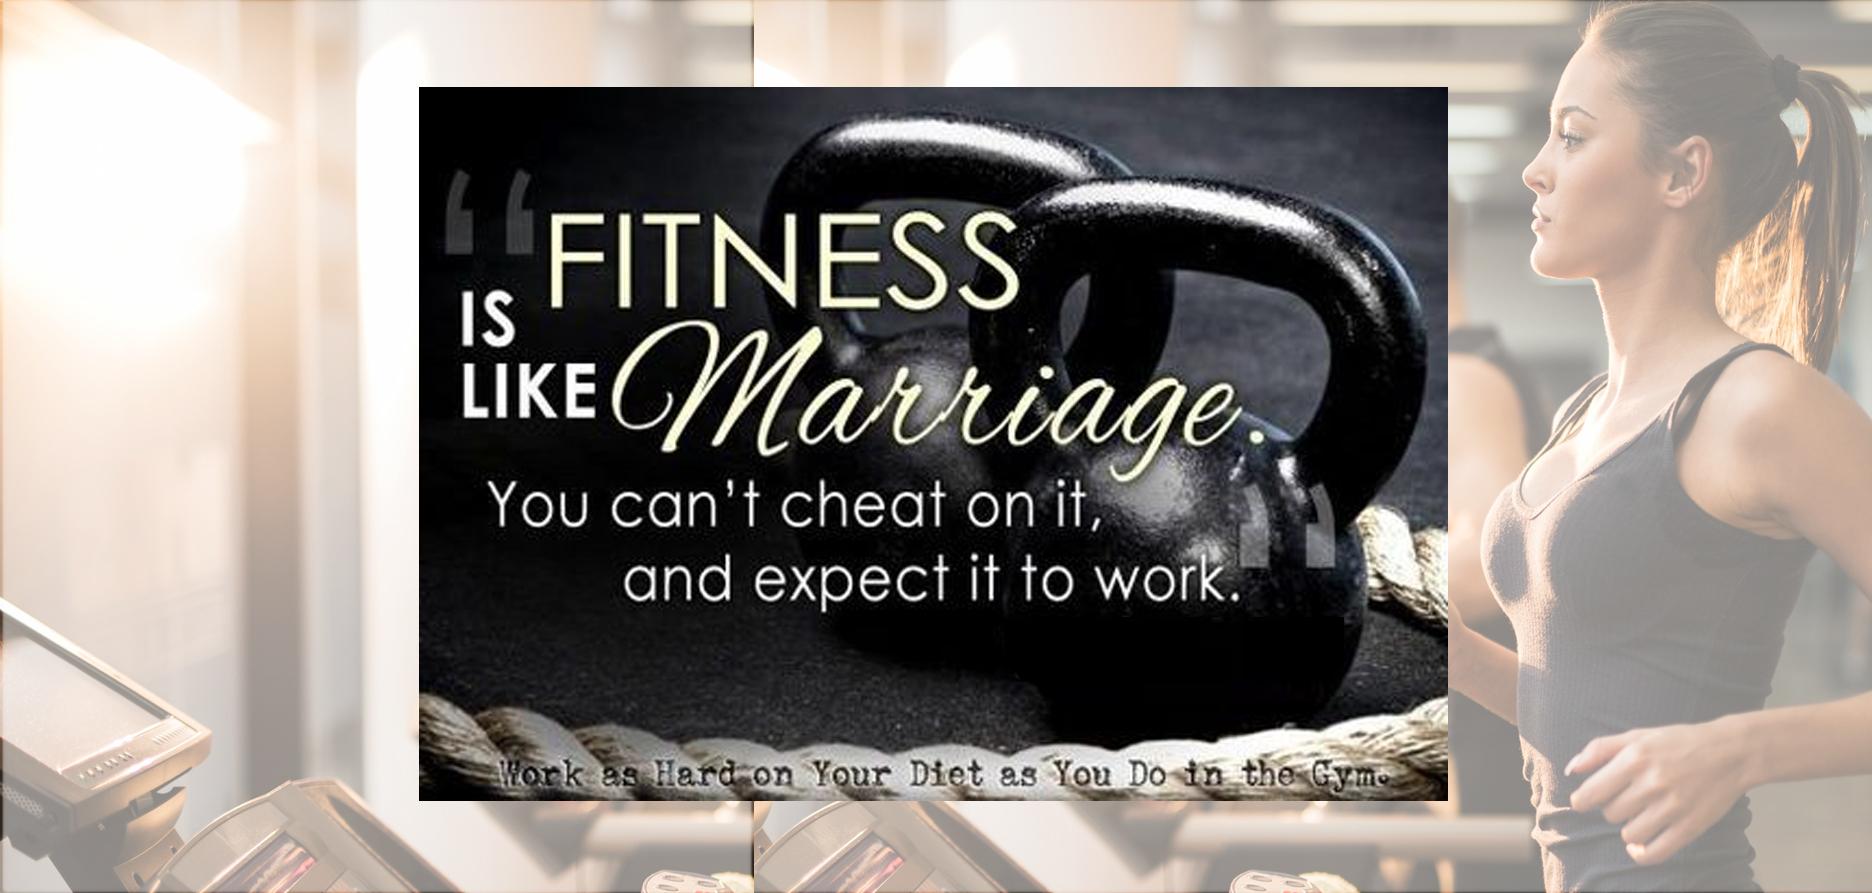 fitness spreuken UIC Lesrooster spreuken – Fitness Way of Life fitness spreuken